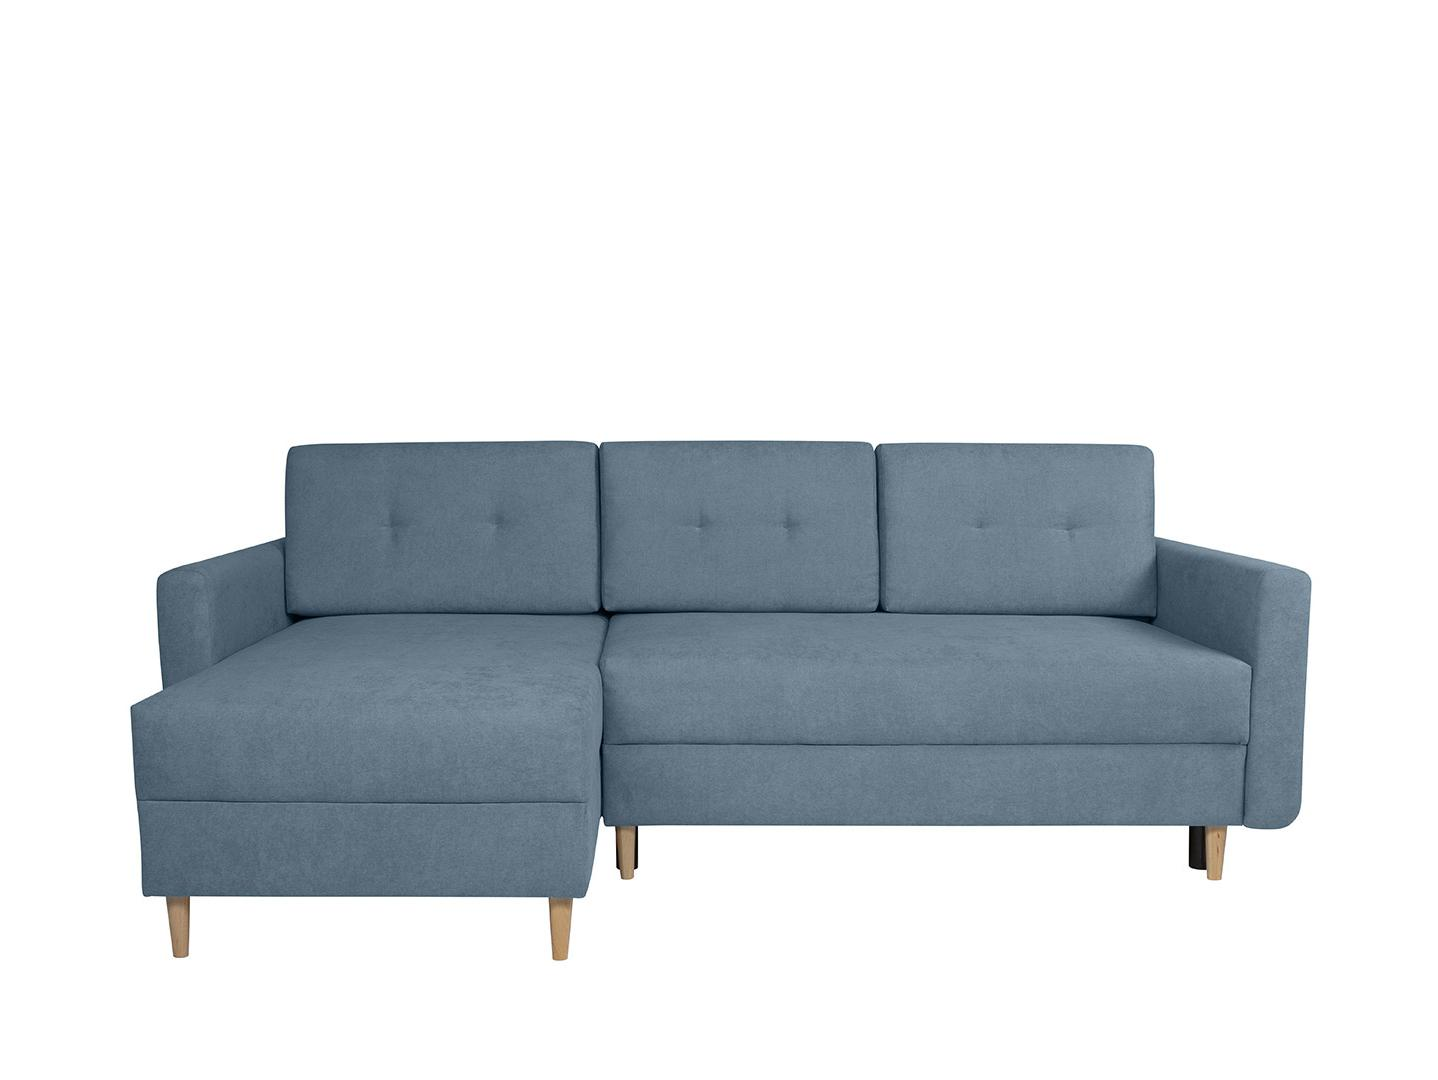 Rohová sedačka BRW Feliz Lux 3DL.URC (tyrkysová) (L)